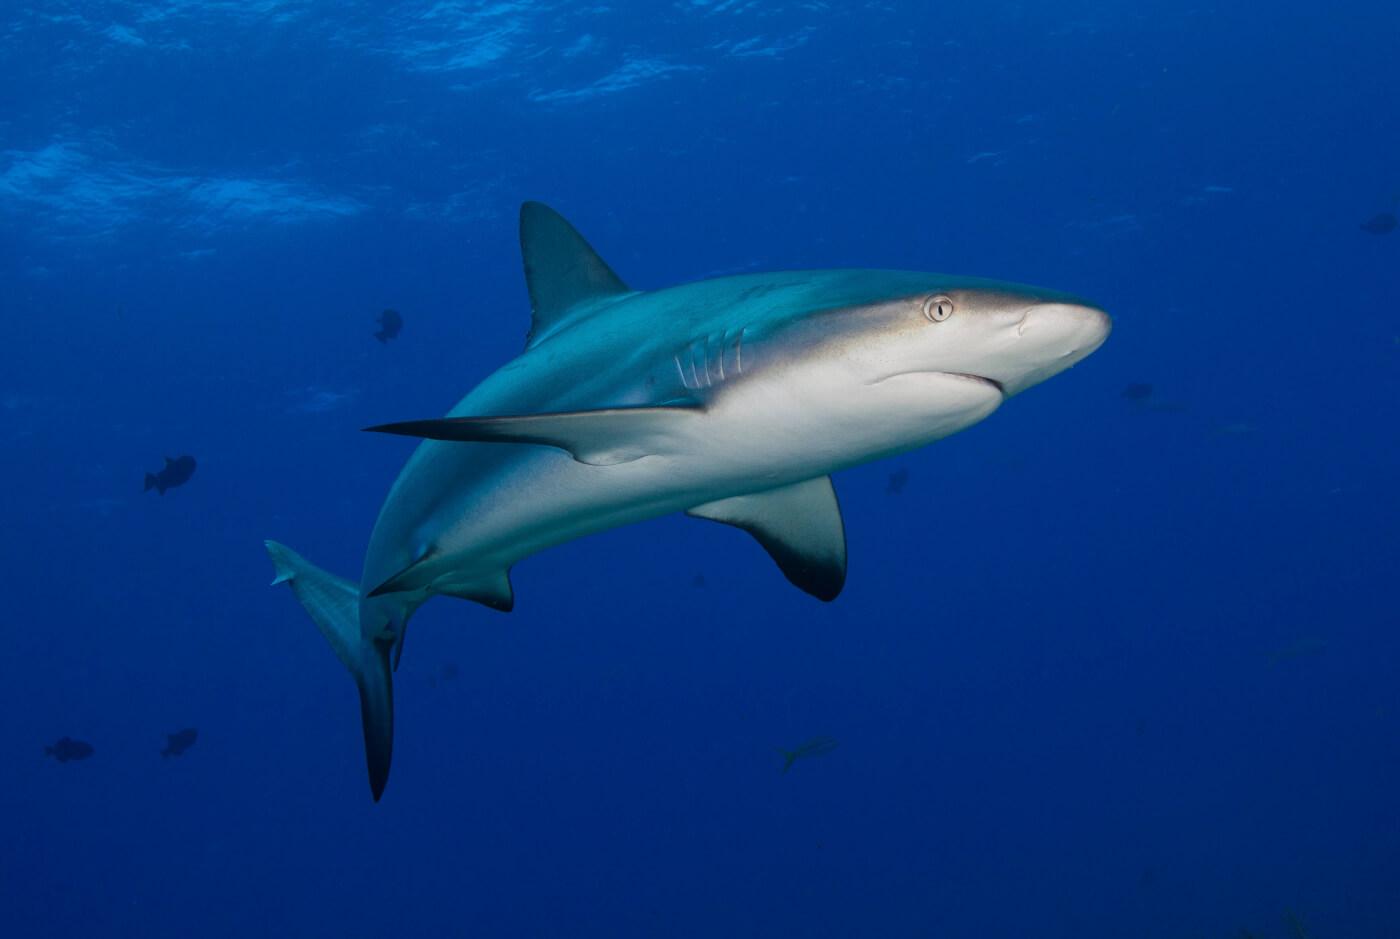 angler hooks shark shark bites man time to ban fishing peta